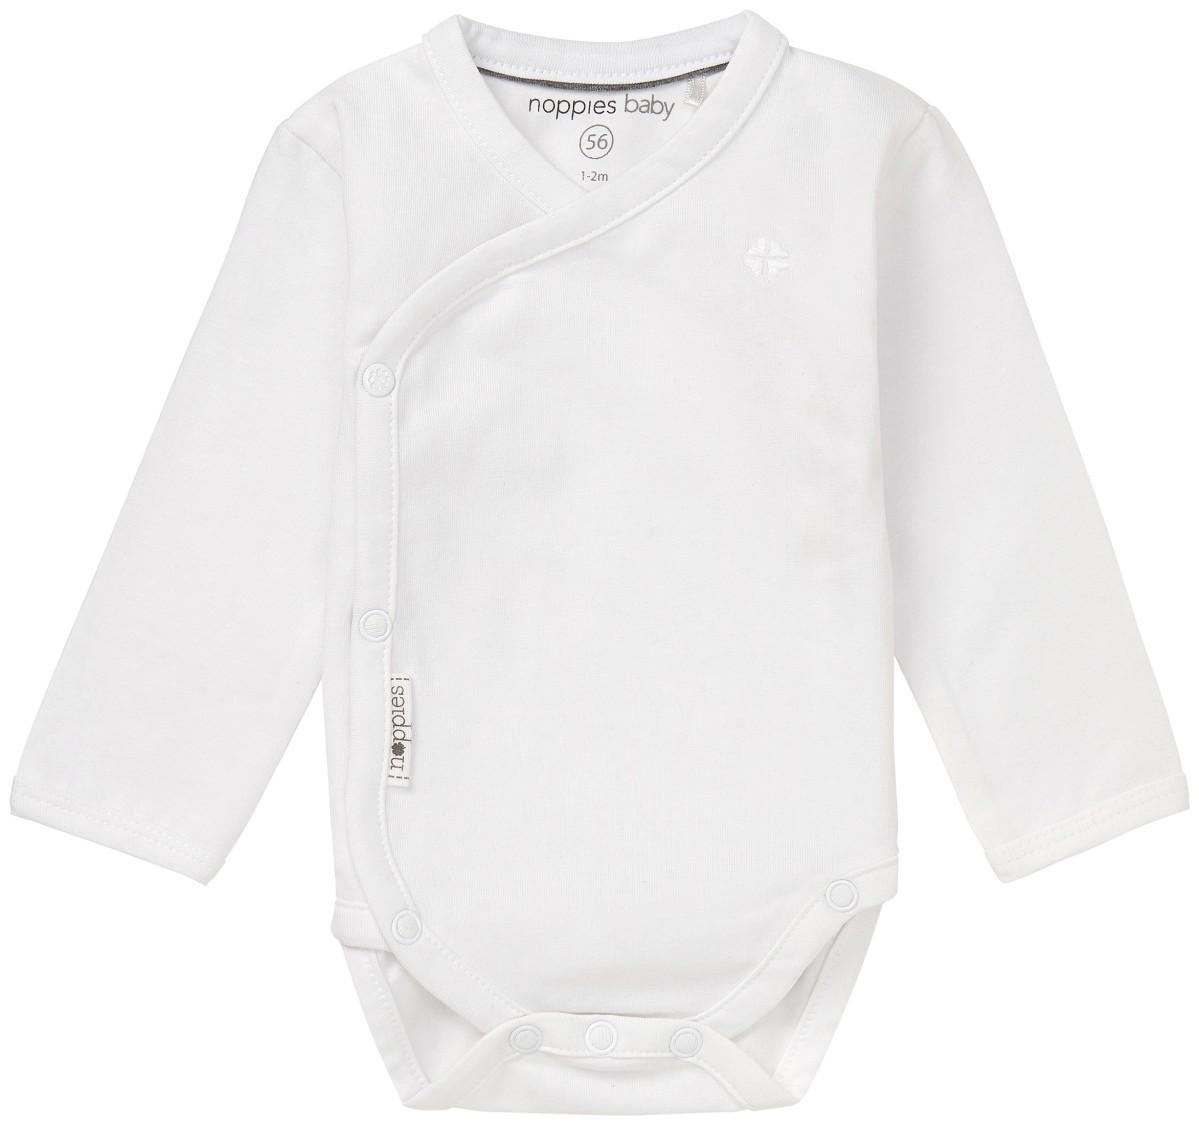 Noppies - Babypakje Ziara White - 3M